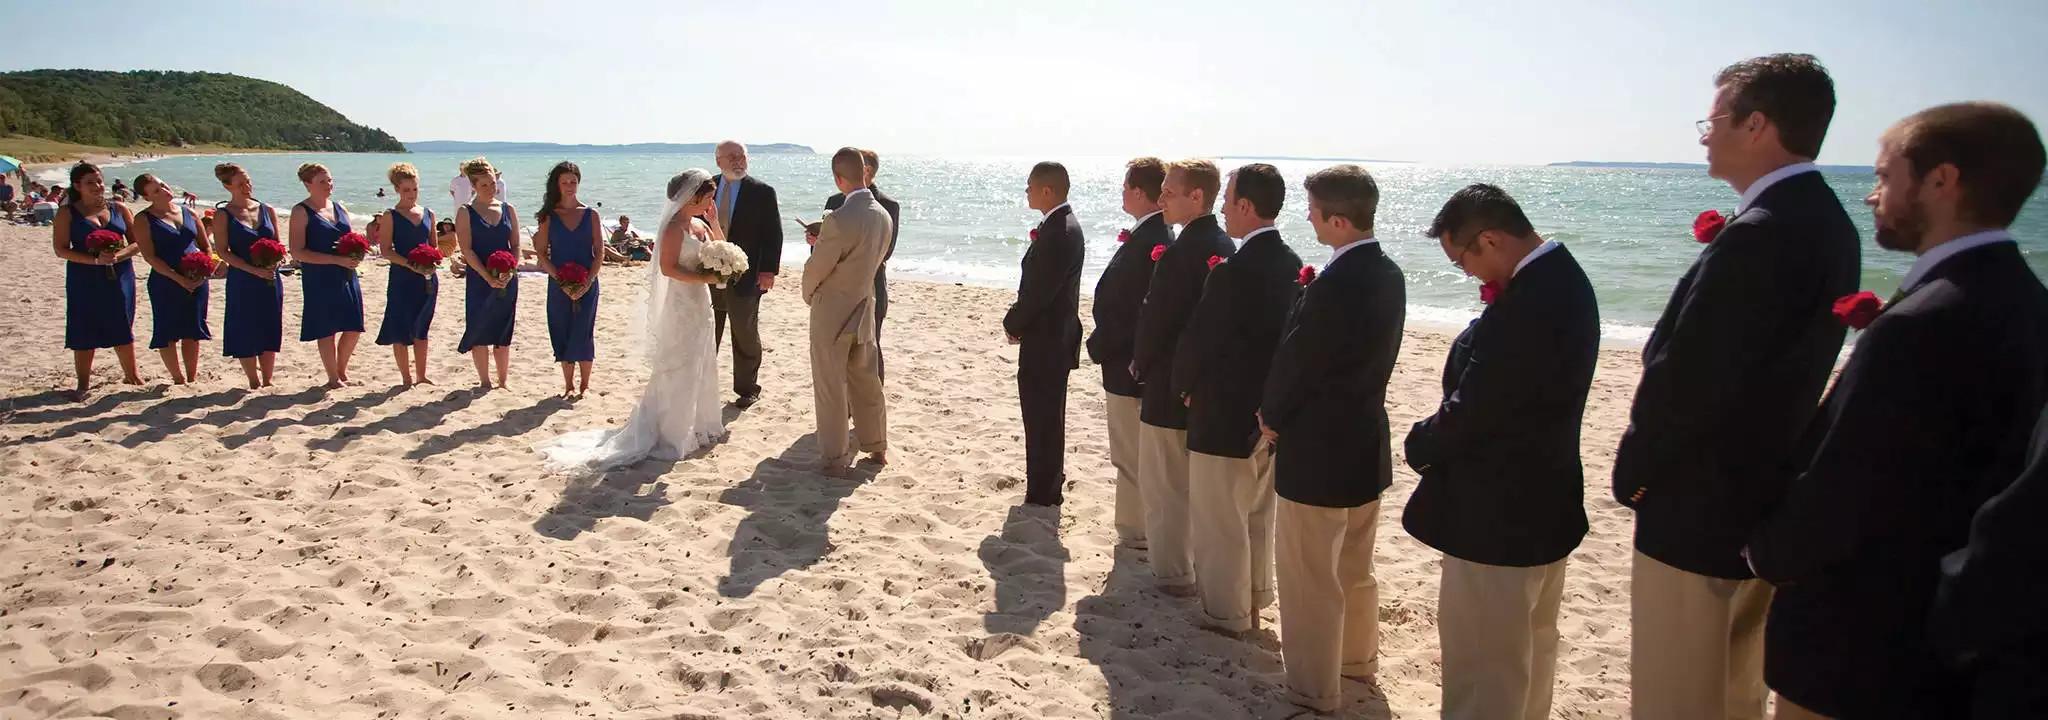 Traverse City Wedding Venues Resorts Hotels Beaches